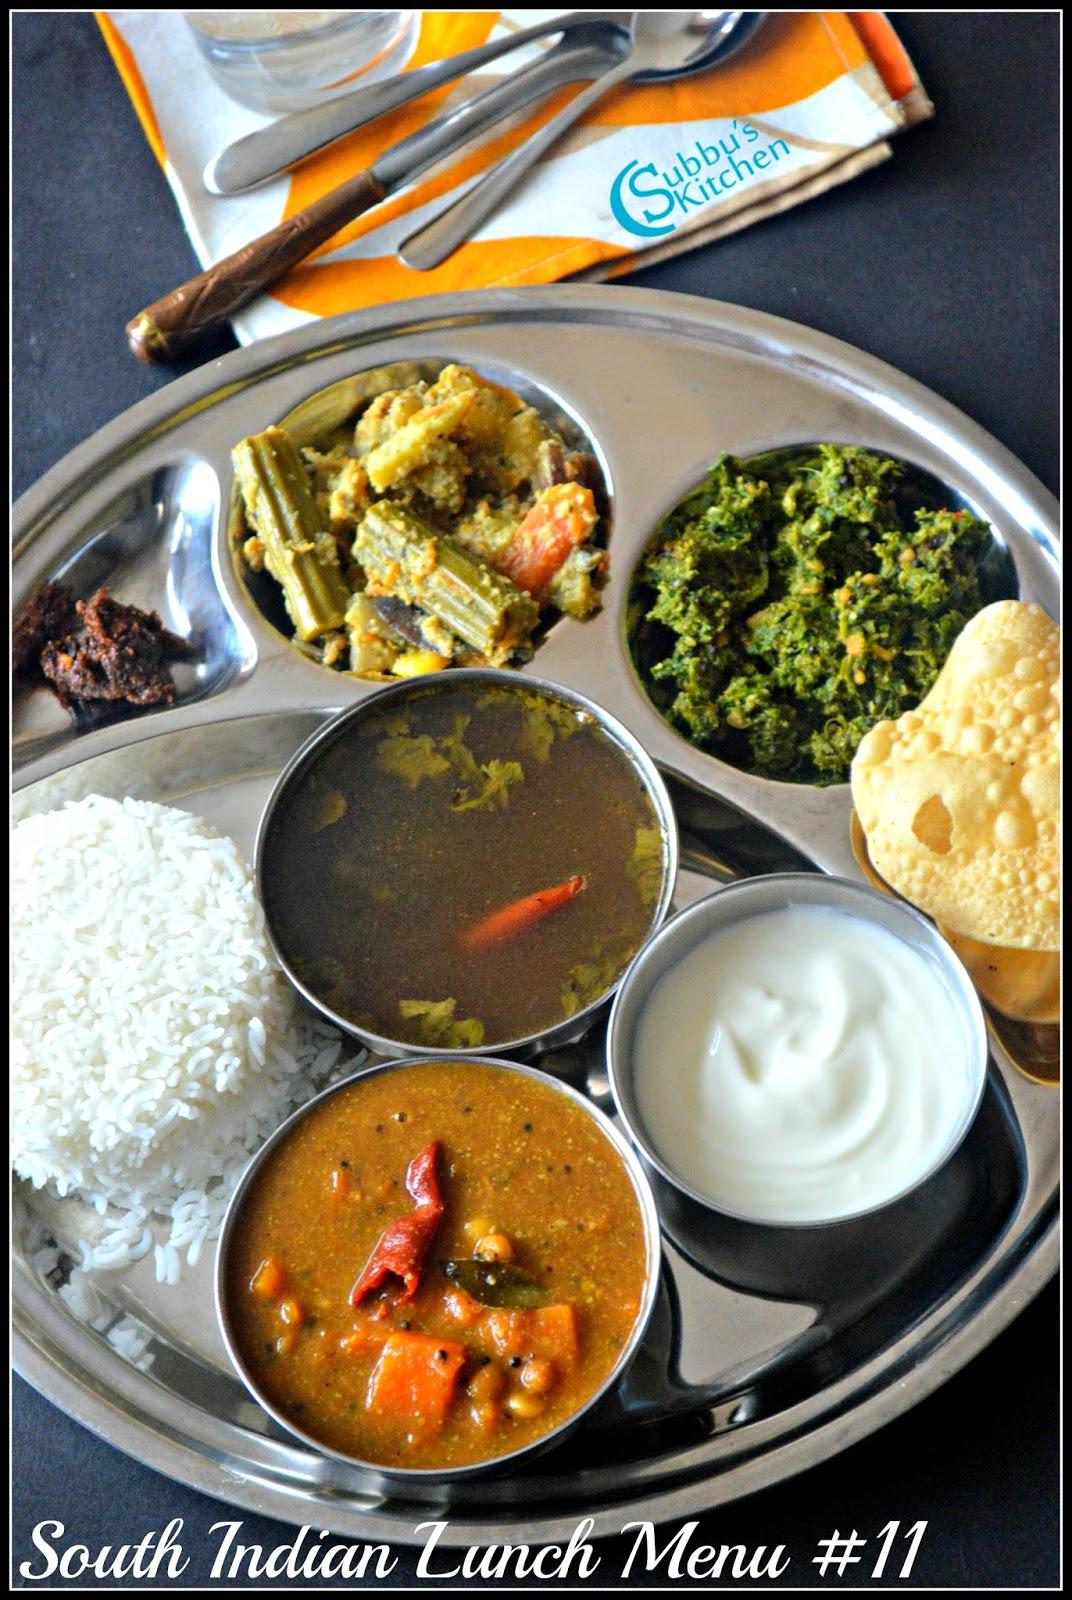 South Indian Lunch Menu 11 - Parangikai Puli Kuzhambu, Aviyal, Keerai Thuvaran and Kottu Rasam